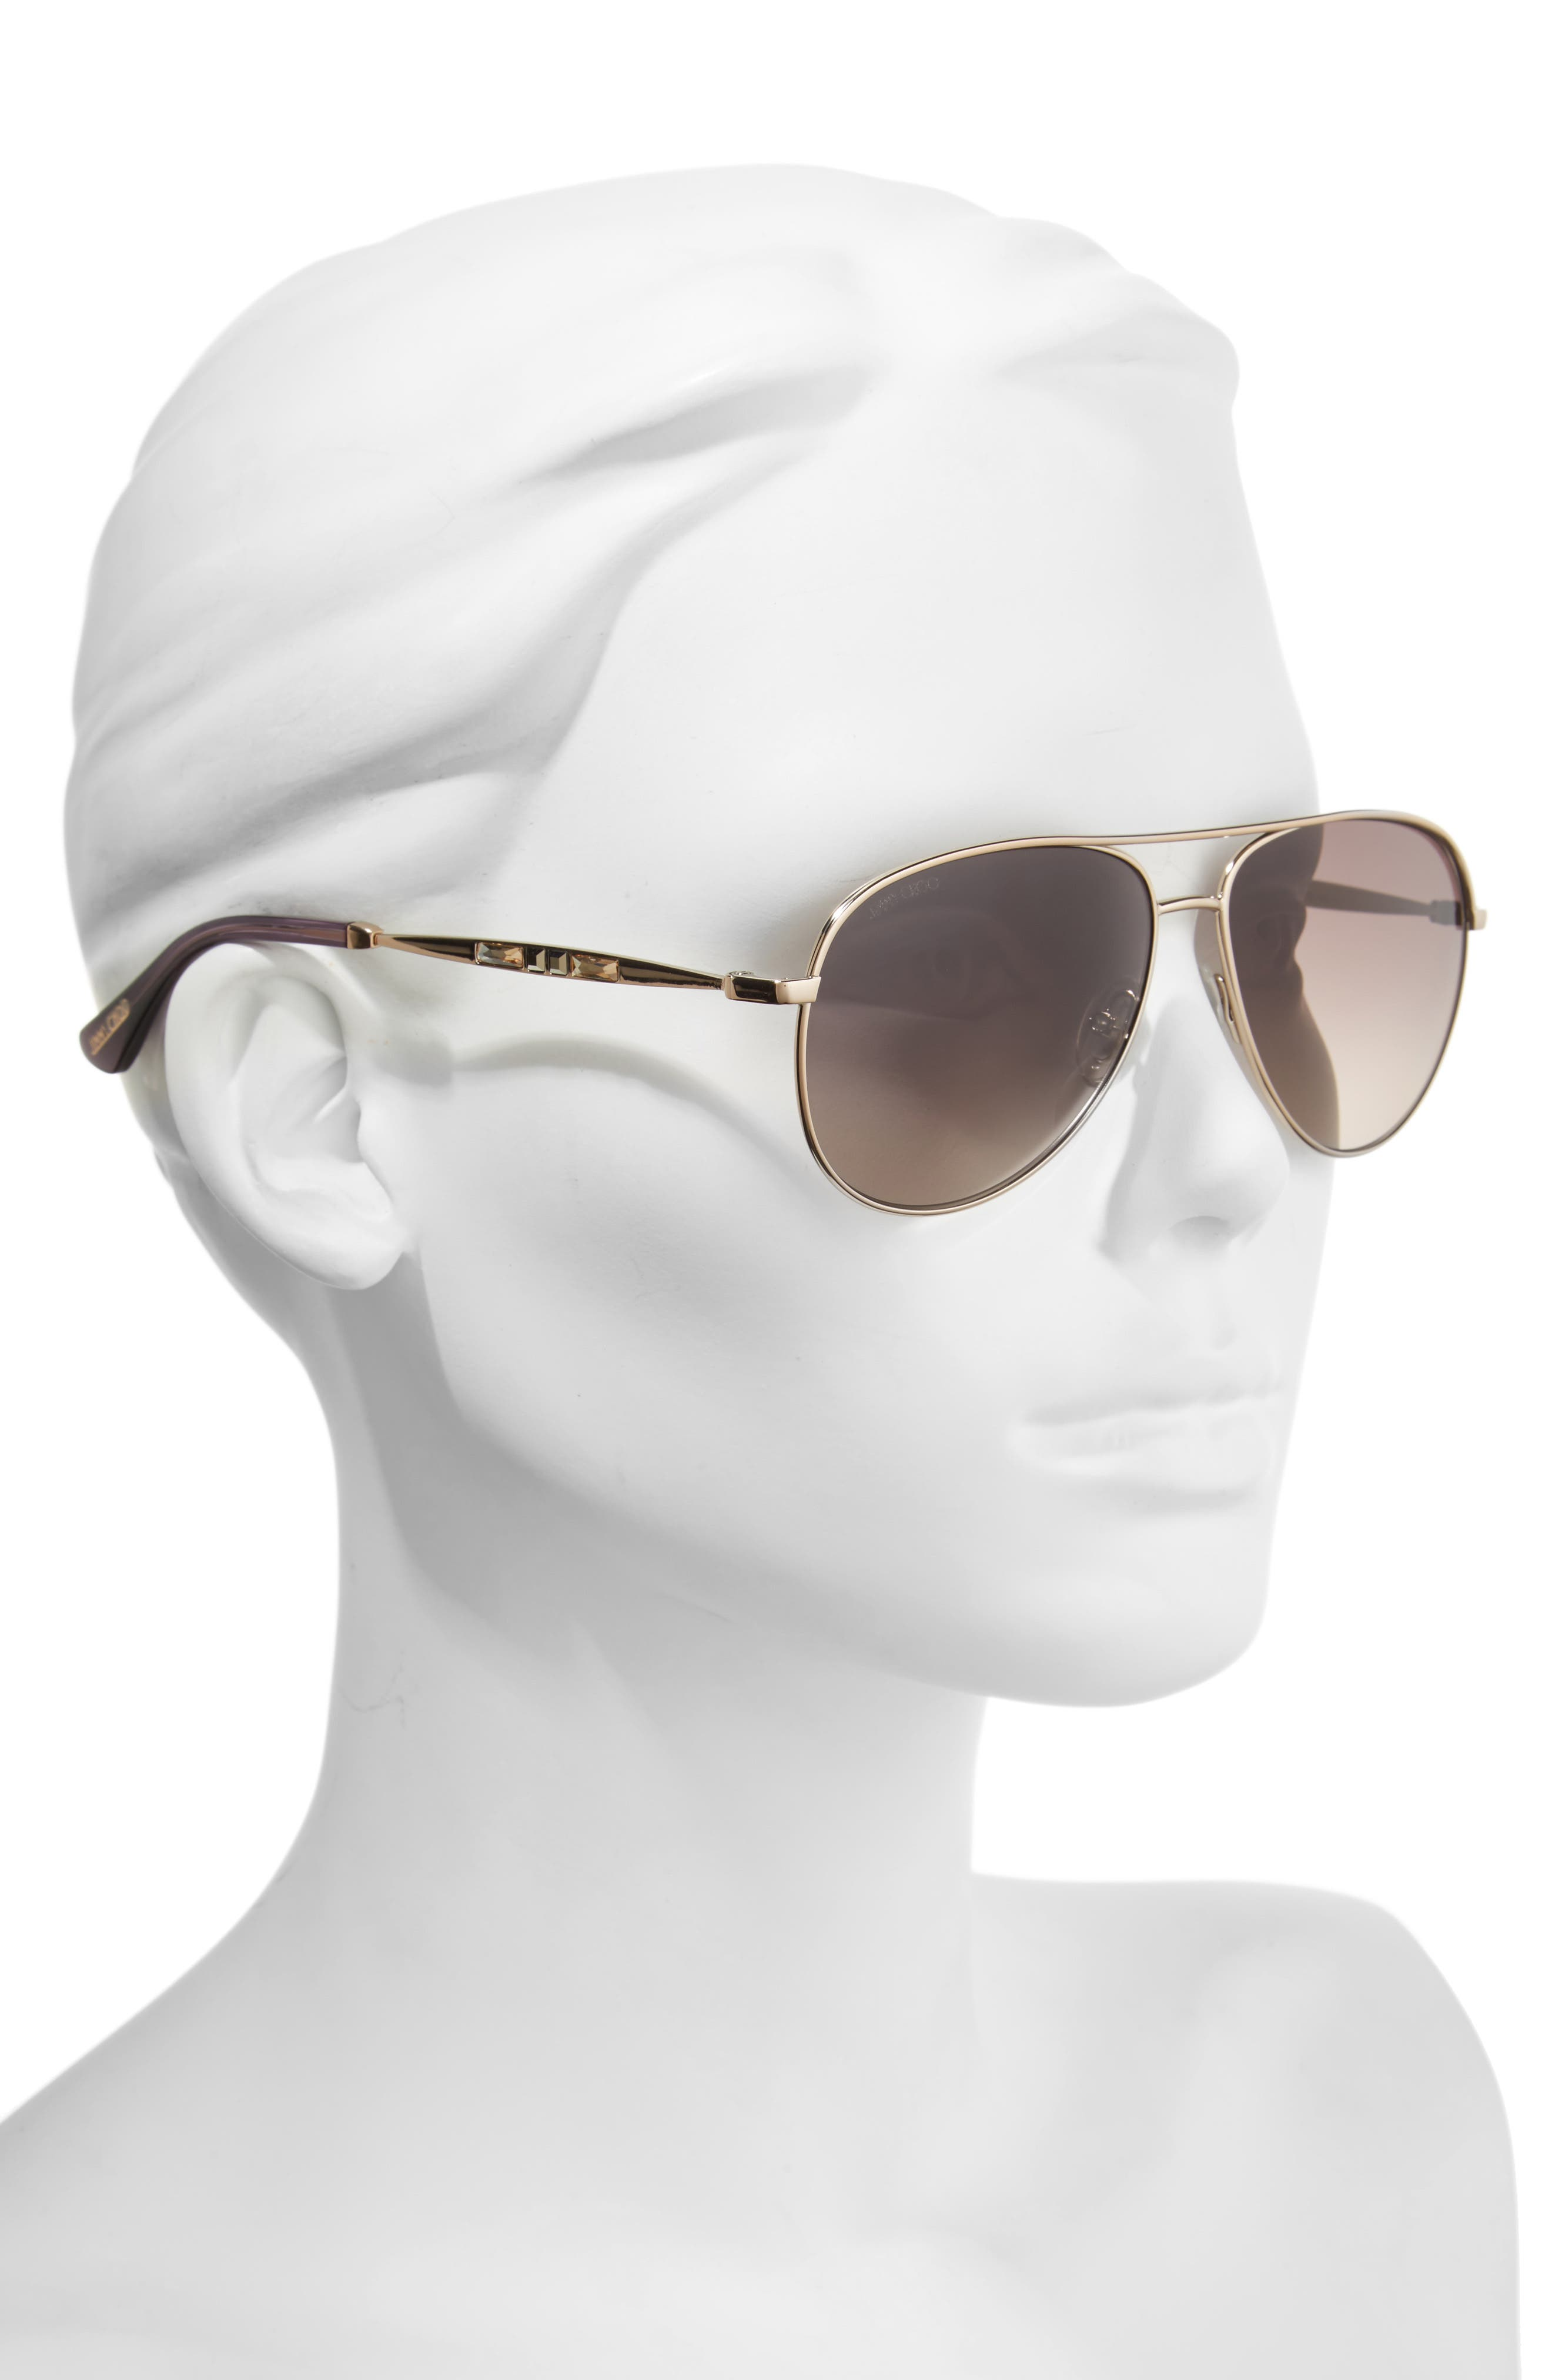 Jewlys 58mm Aviator Sunglasses,                             Alternate thumbnail 2, color,                             220